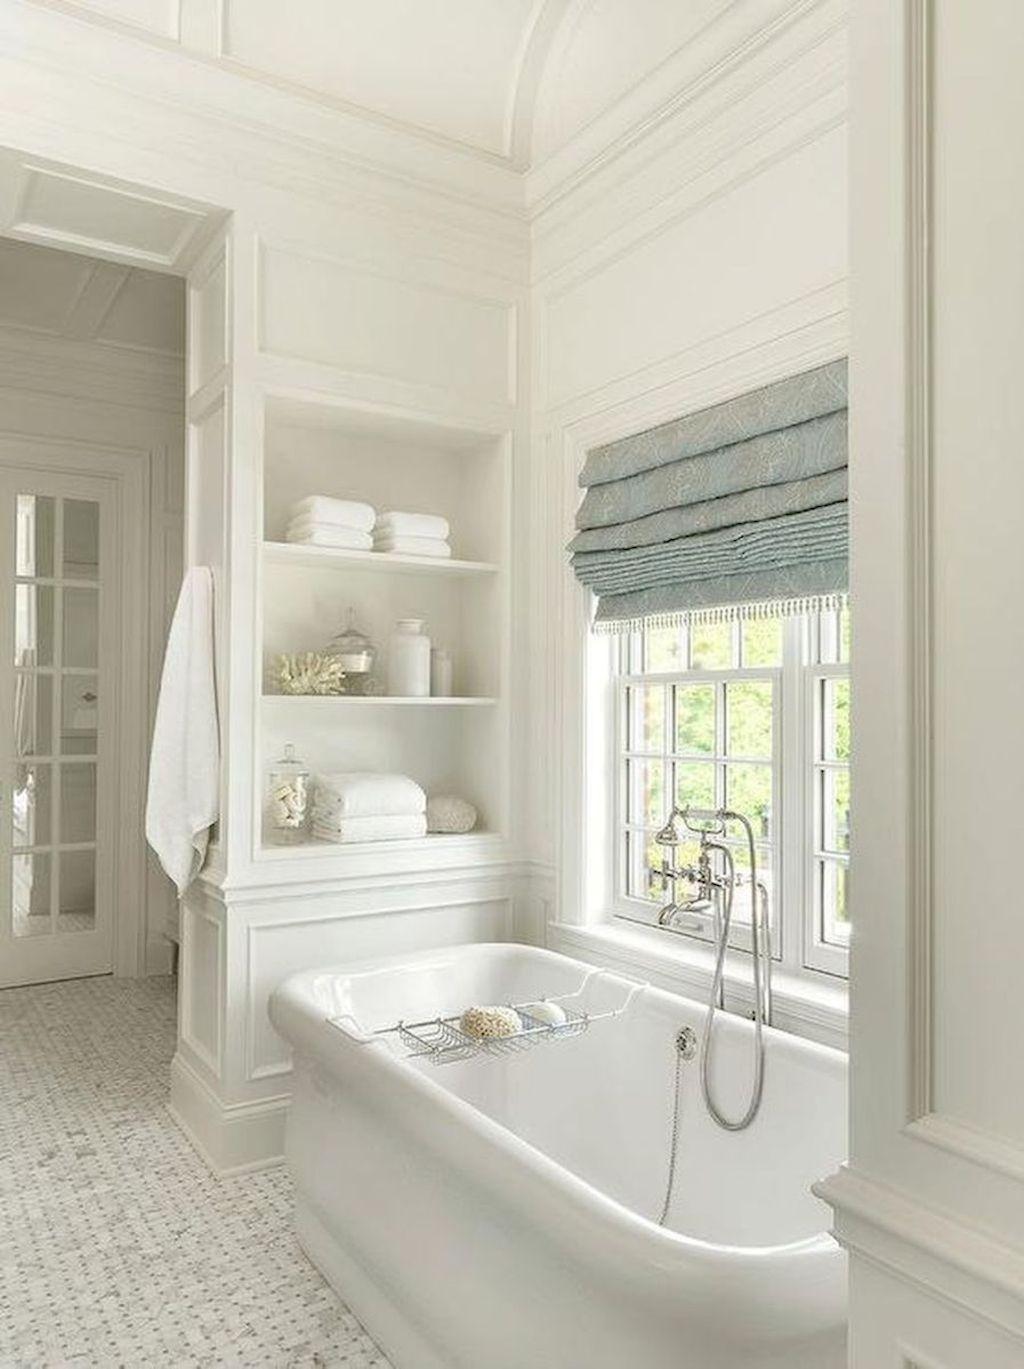 105 Fresh Small Master Bathroom Remodel Ideas | Master bathrooms ...